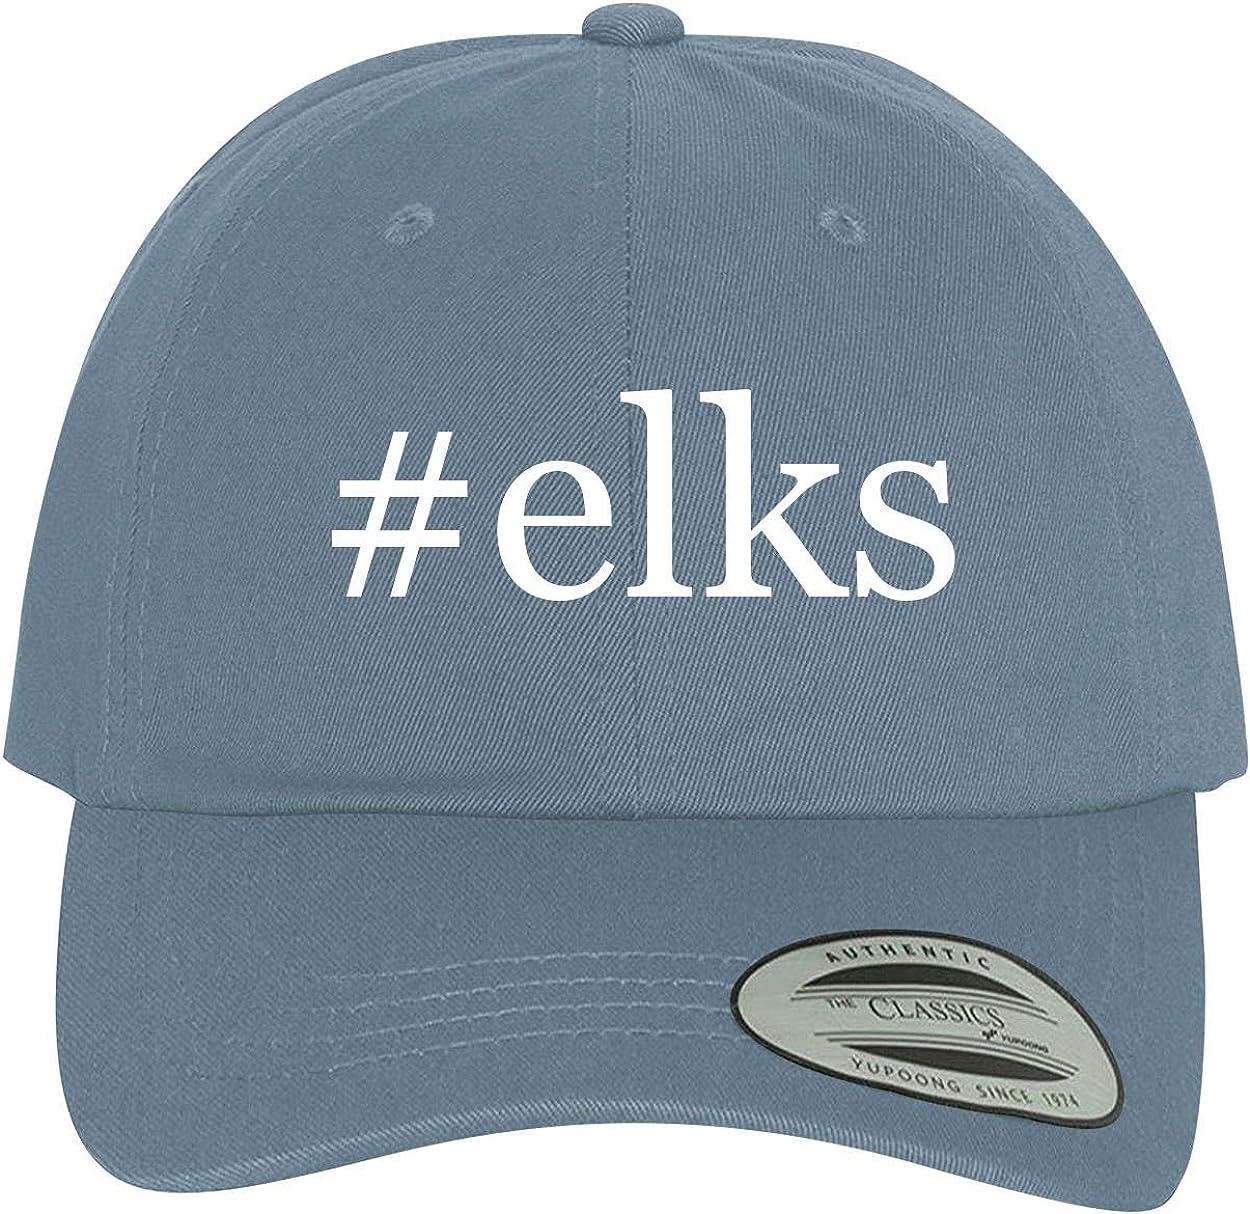 #elks Comfortable Dad Hat Baseball Cap